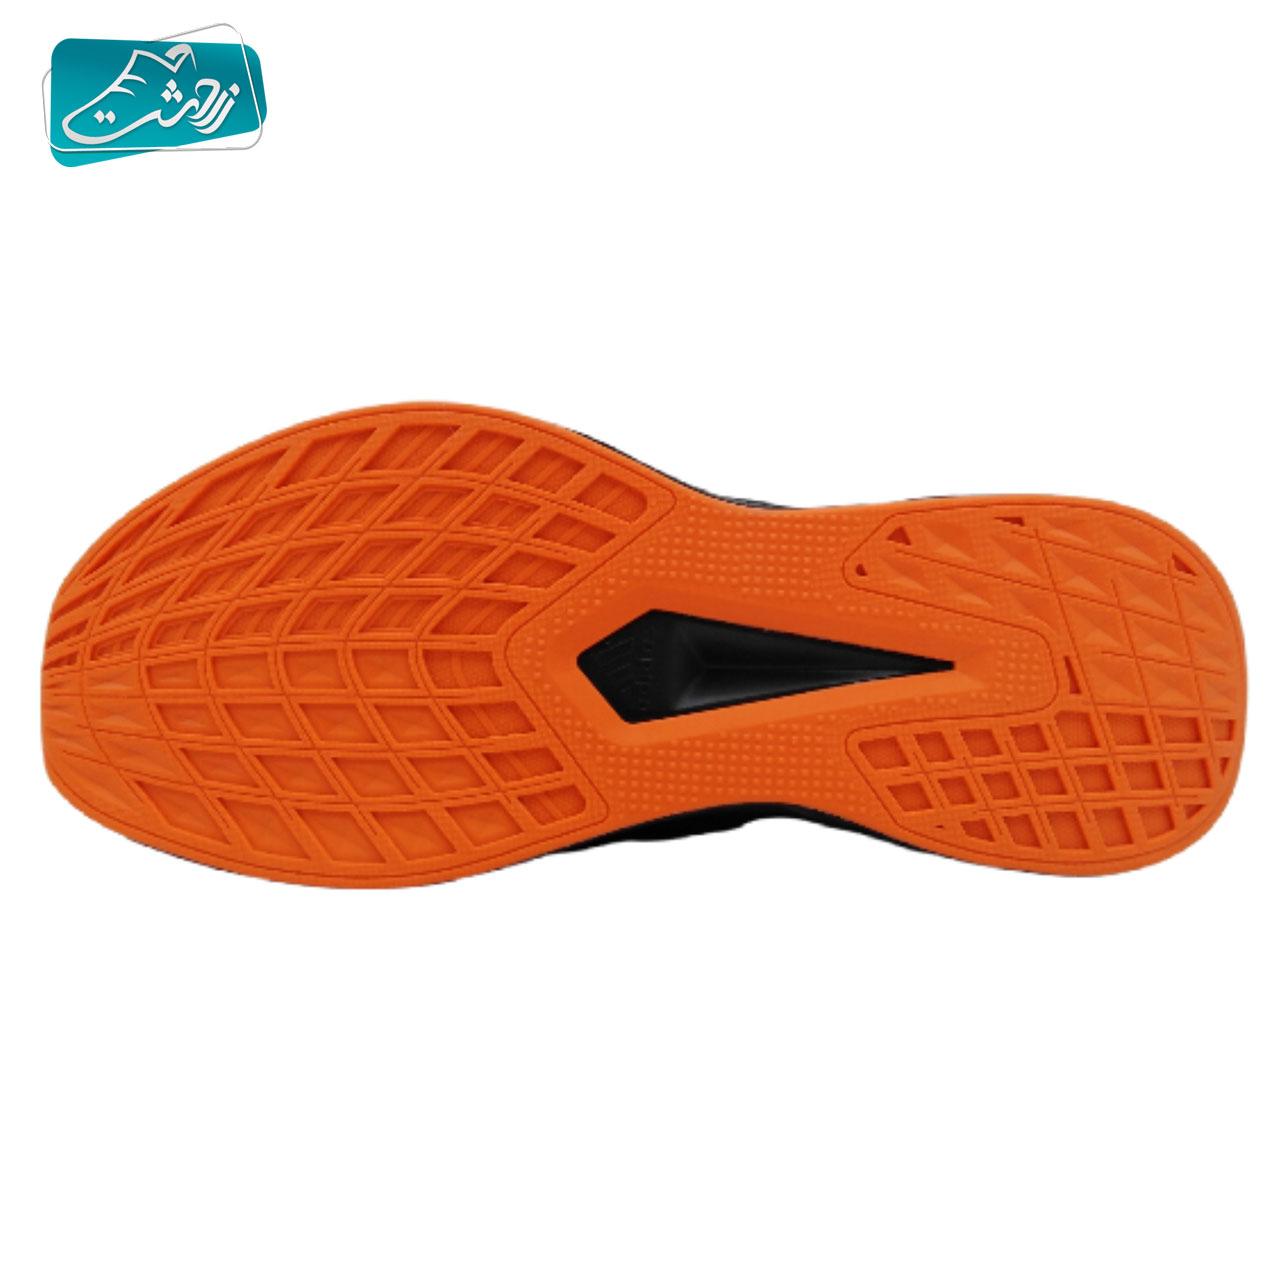 http://zarshoes.ir/uploadfile/file_portal/site_5571_web/file_portal_end/shop/انبار-قدس/product/کفش-ورزشی-10/Marathon-16-tr-m_B-blkoring/1.jpg